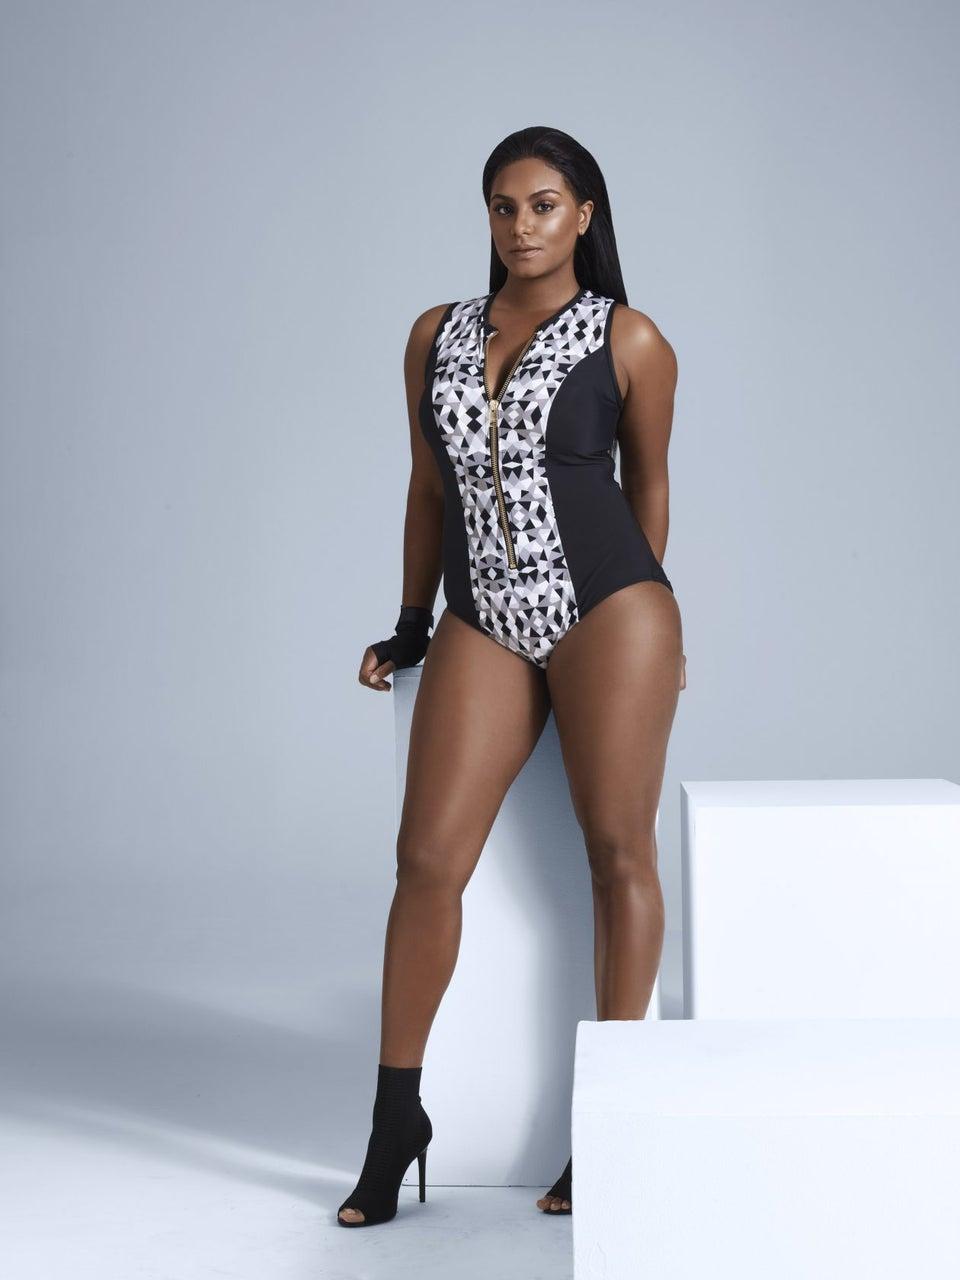 Queen Latifah's Stylist Debuts Plus Size Swim Collection, Talks Celebrating Curves